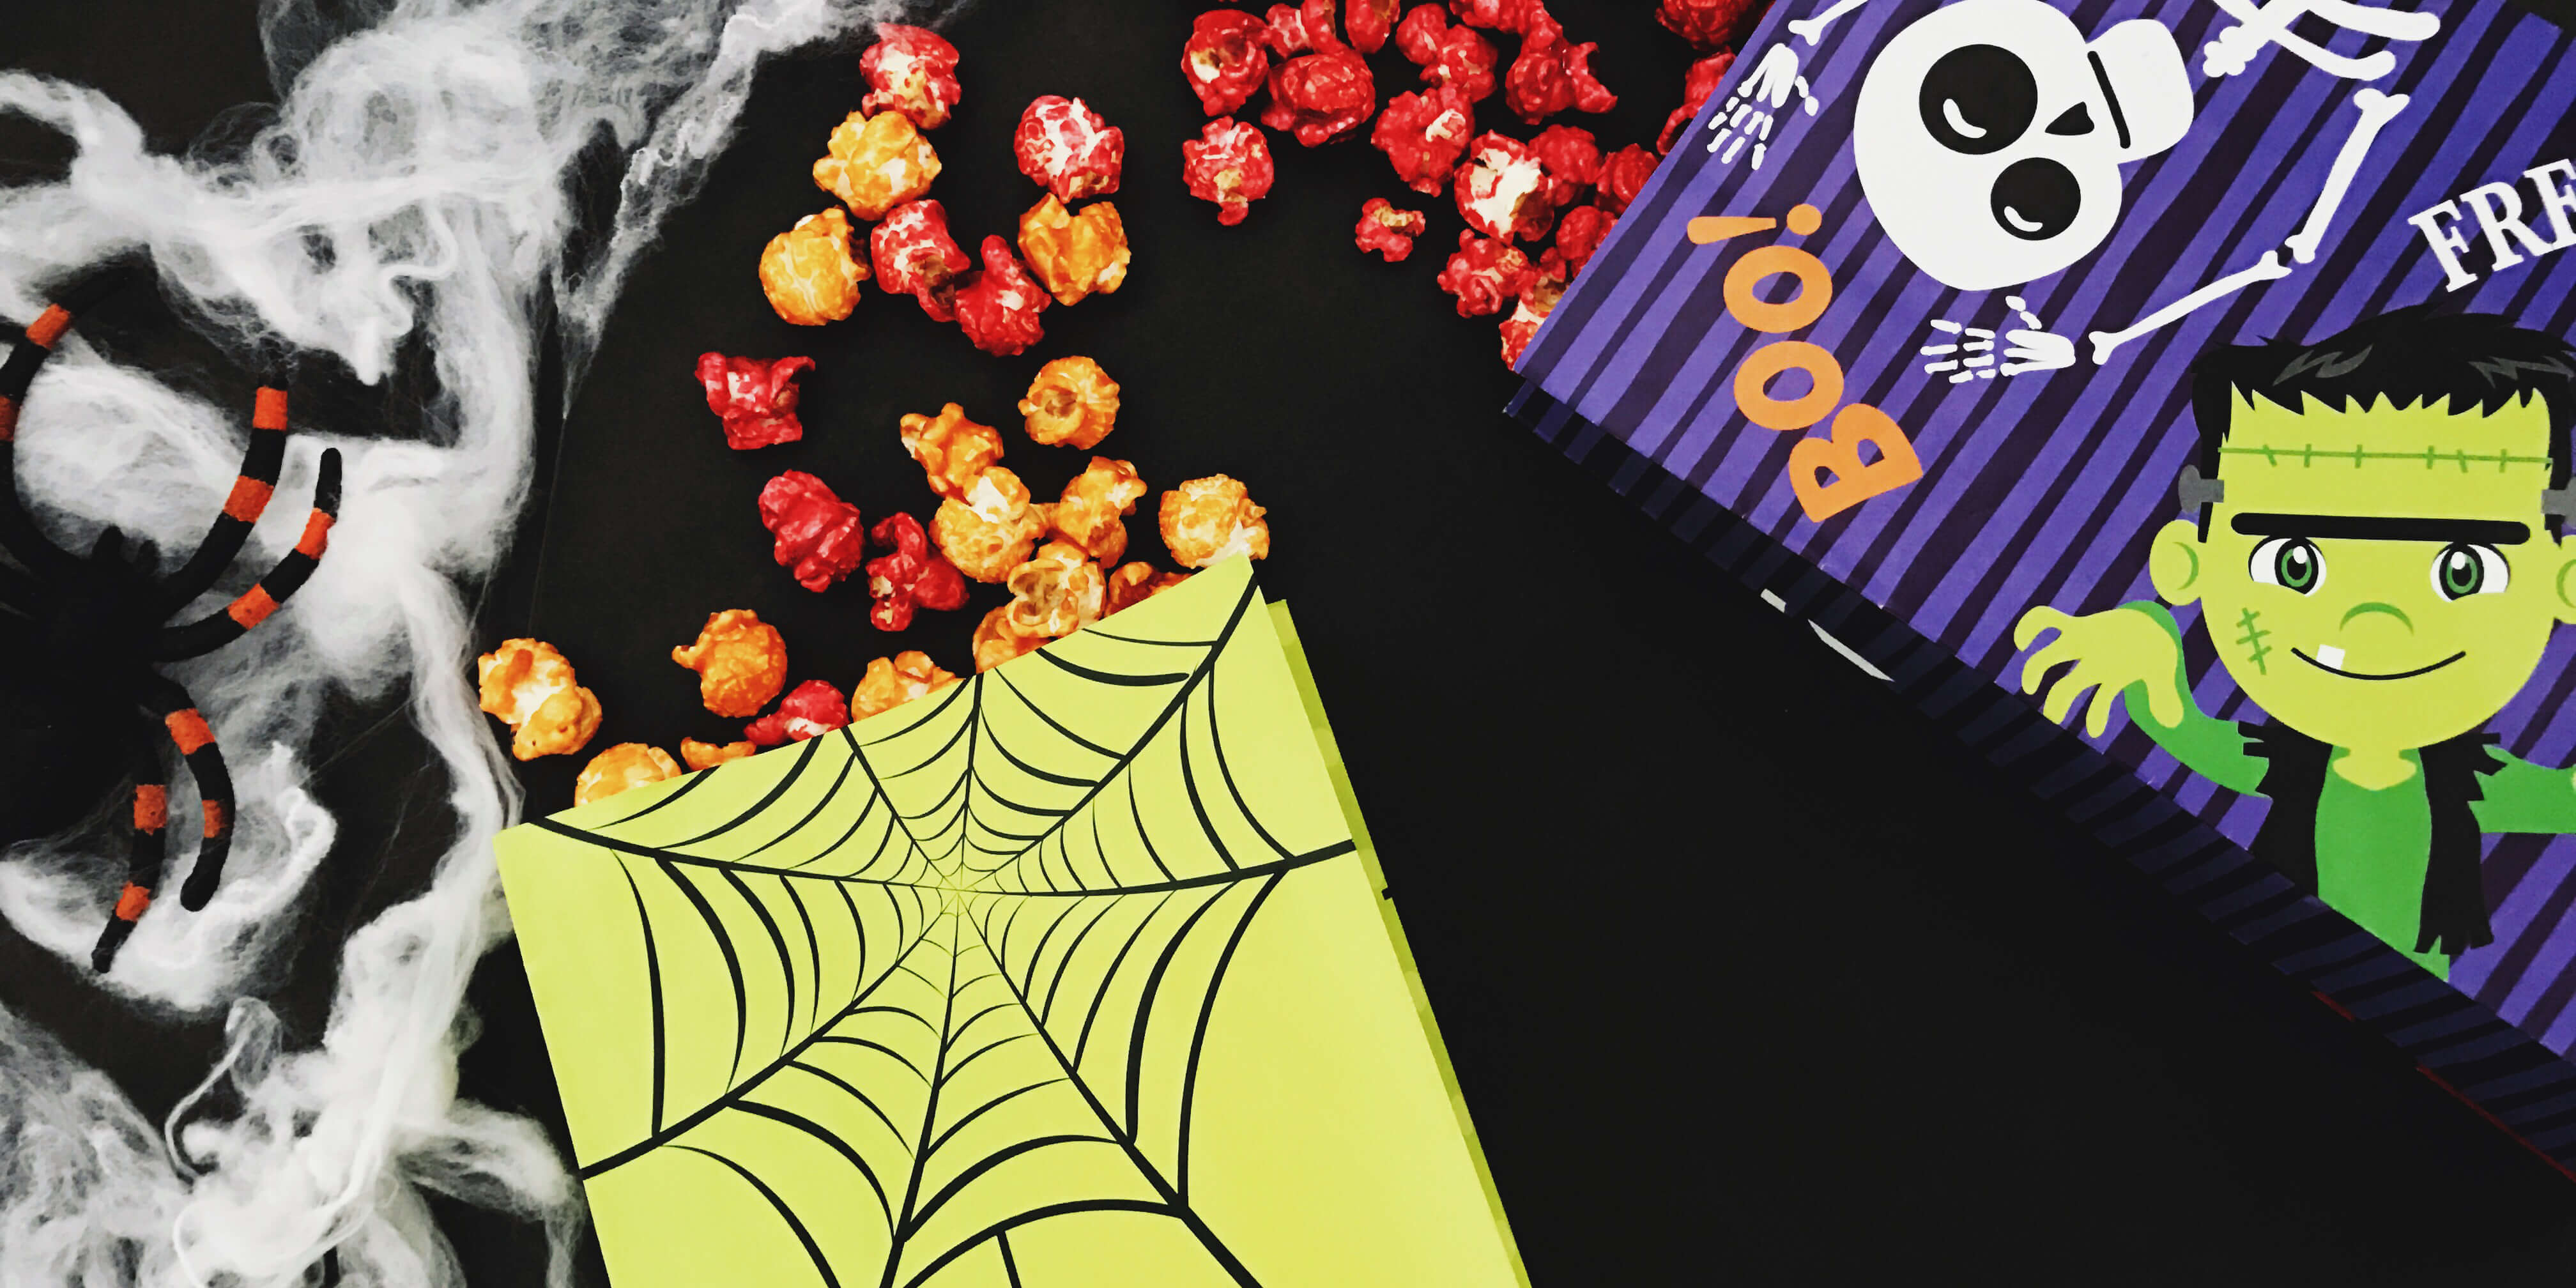 Adorable Halloween Decorations Under $20